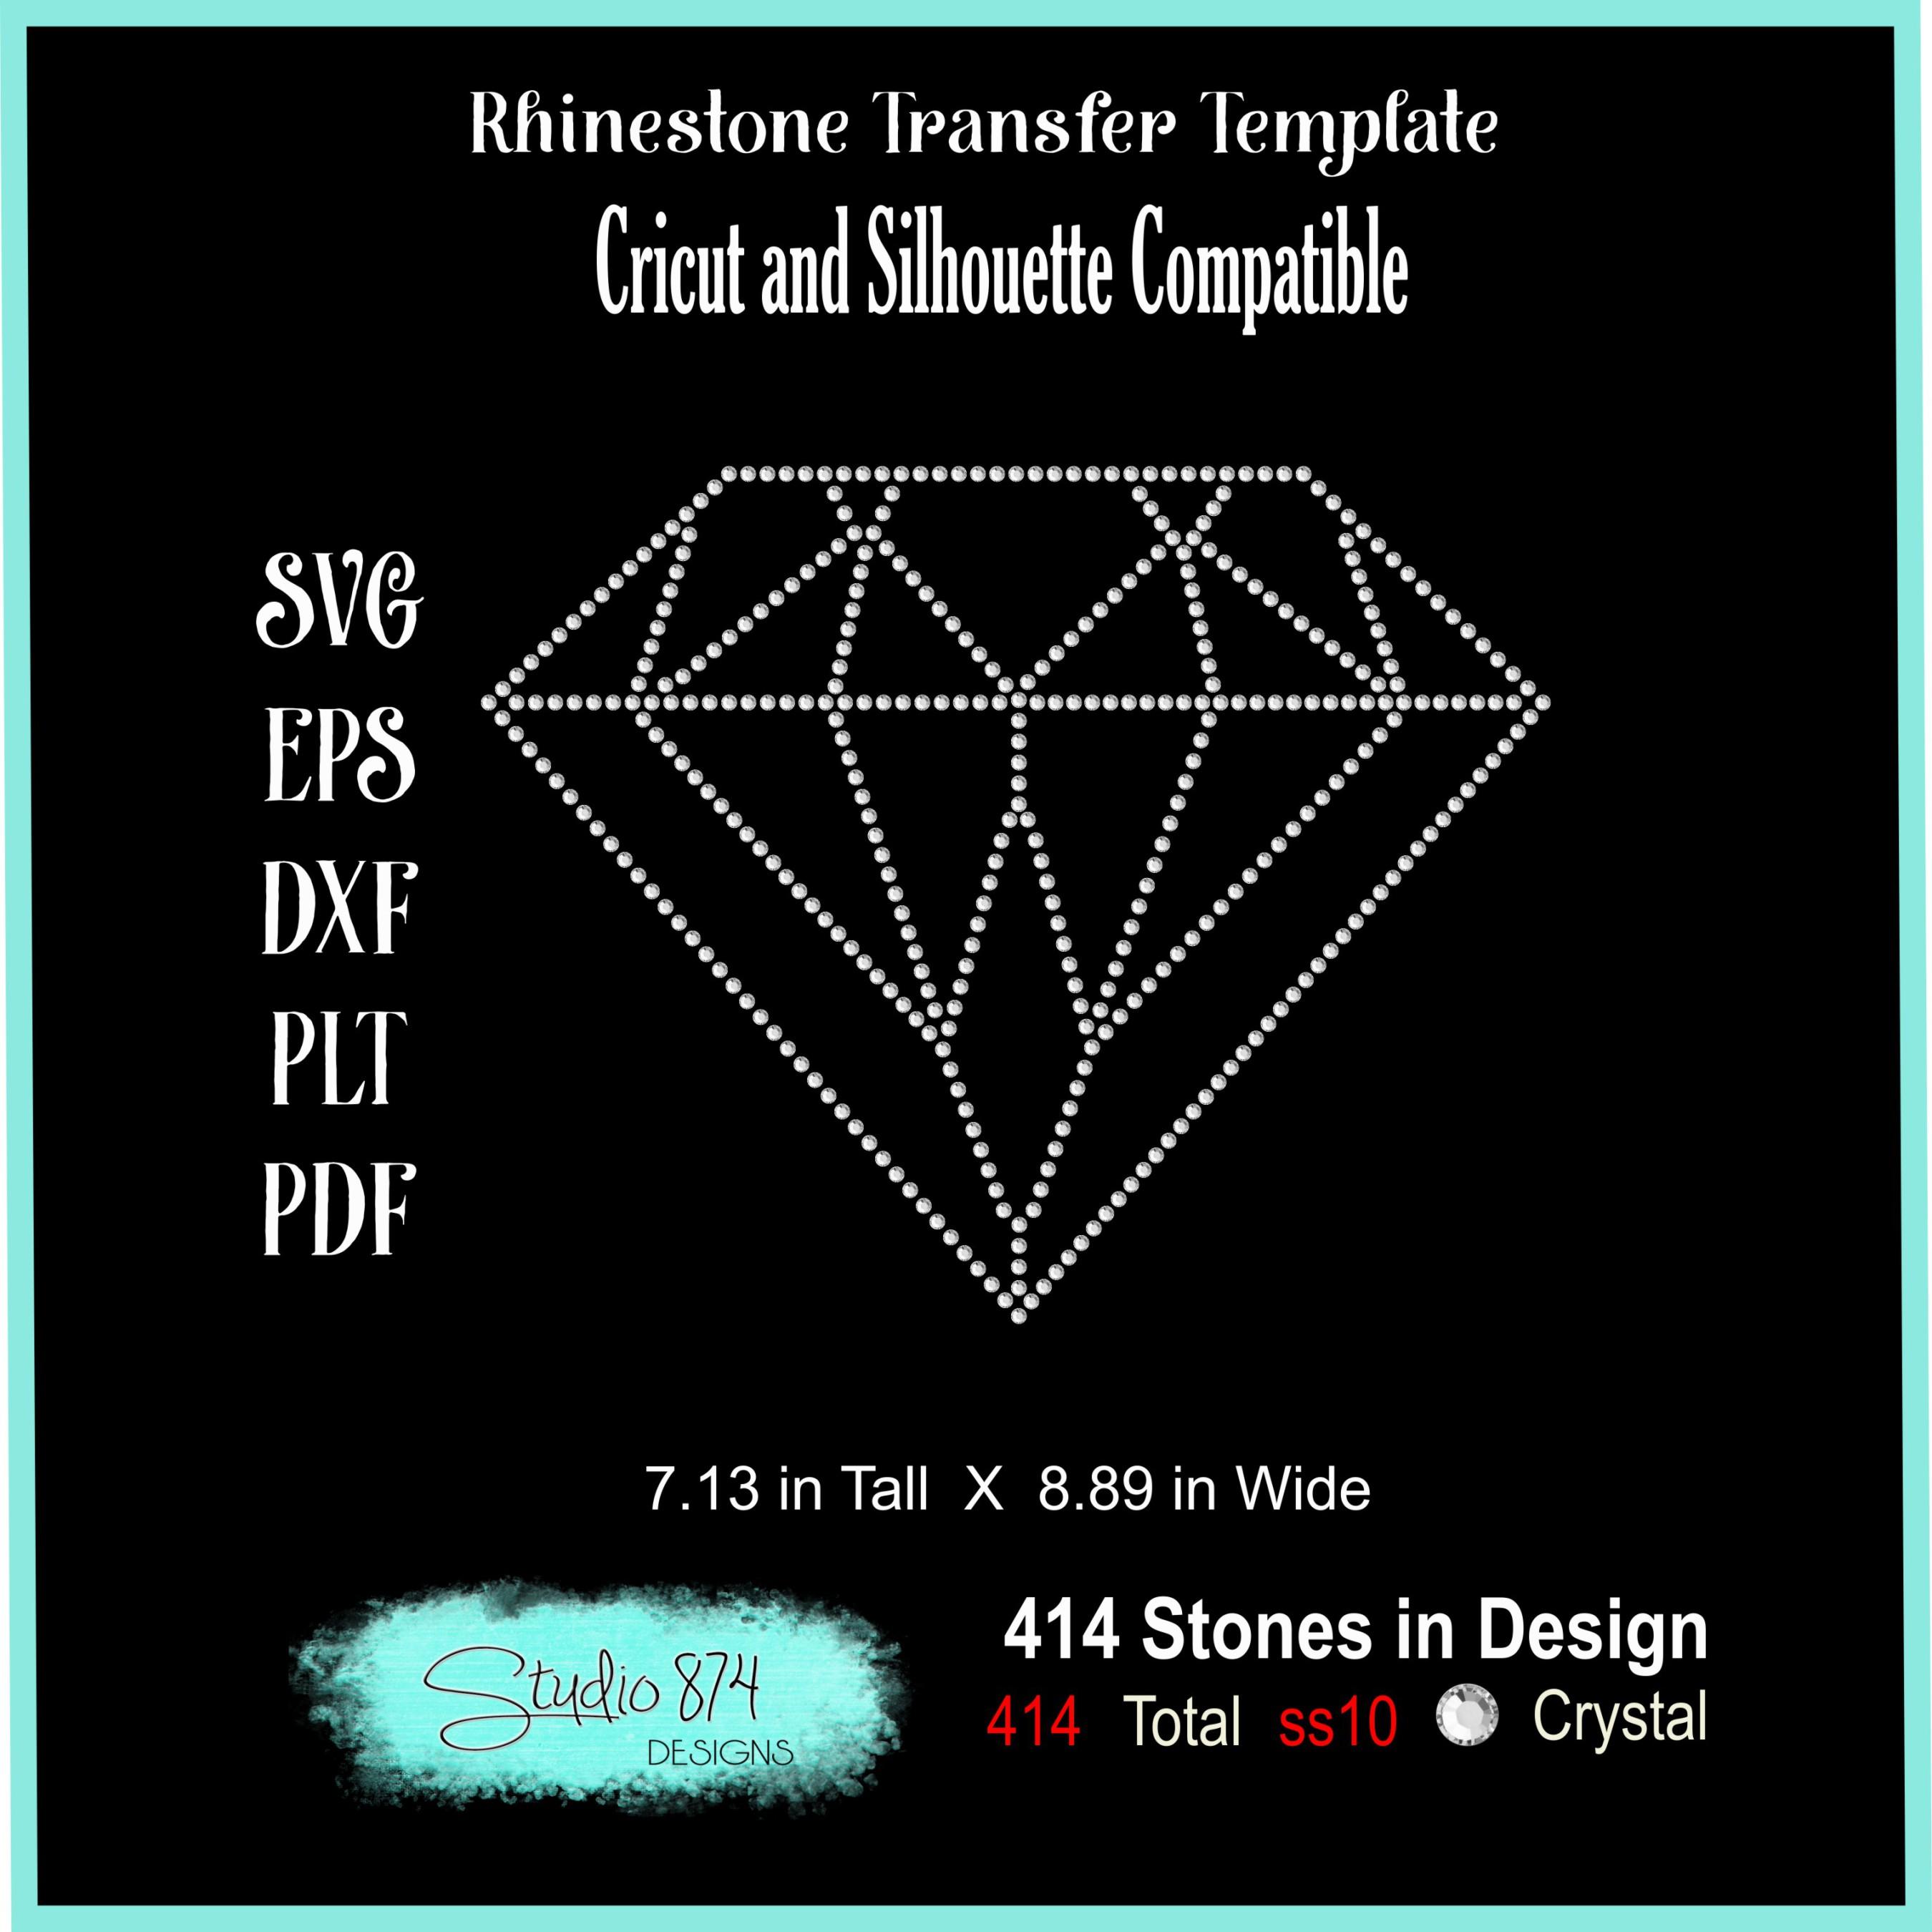 Diamond Rhinestone SVG Template - 9 Inch R1 example image 2